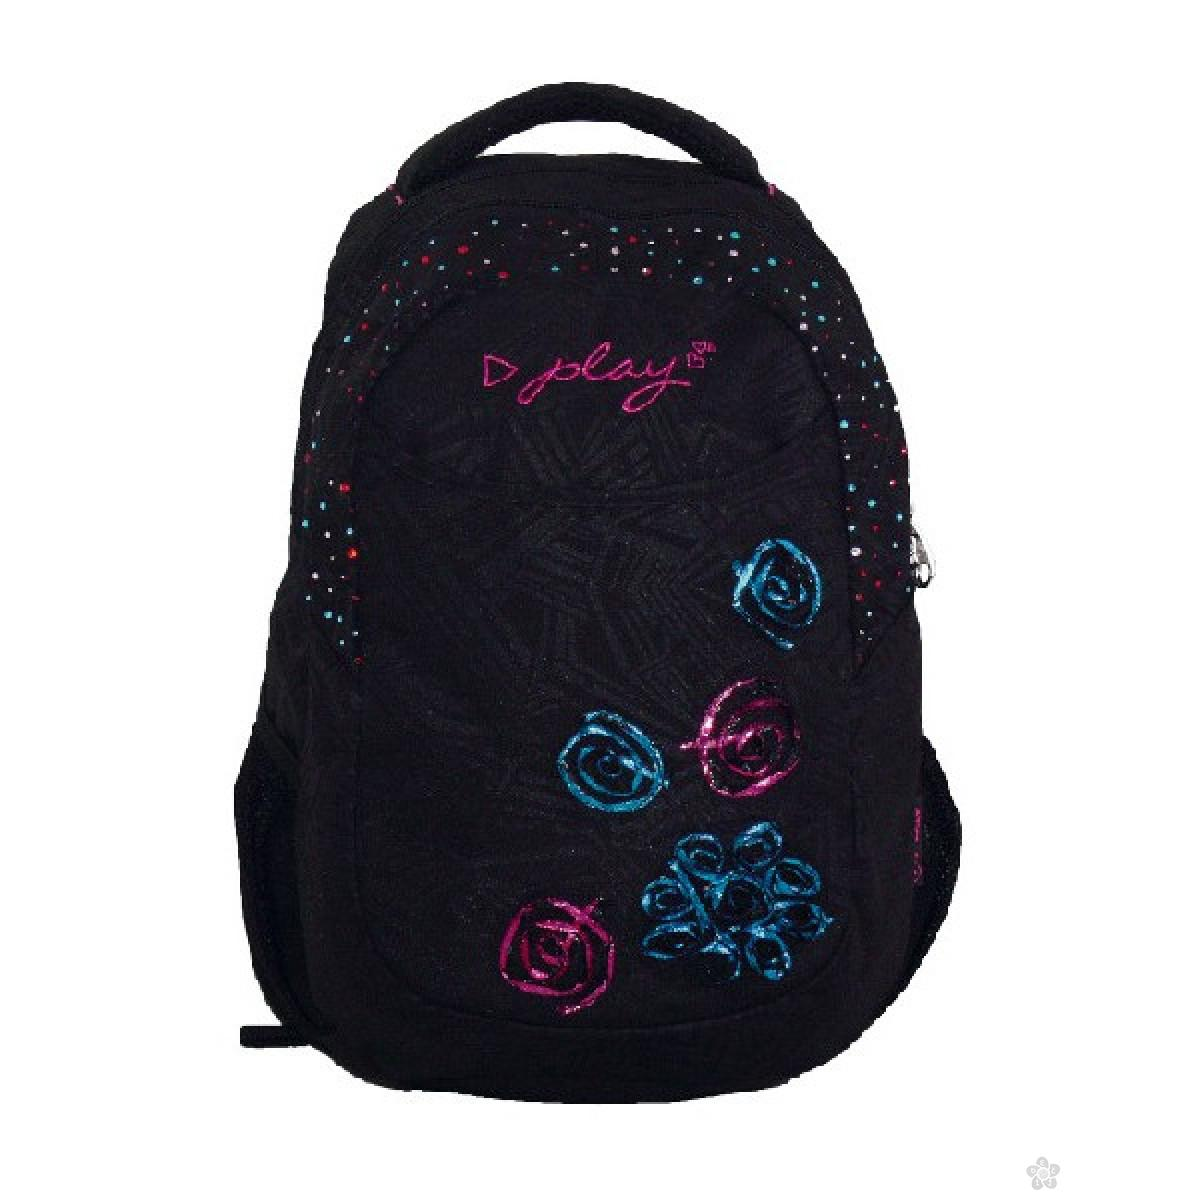 Ranac za školu J-fashion  Flower black, 160500